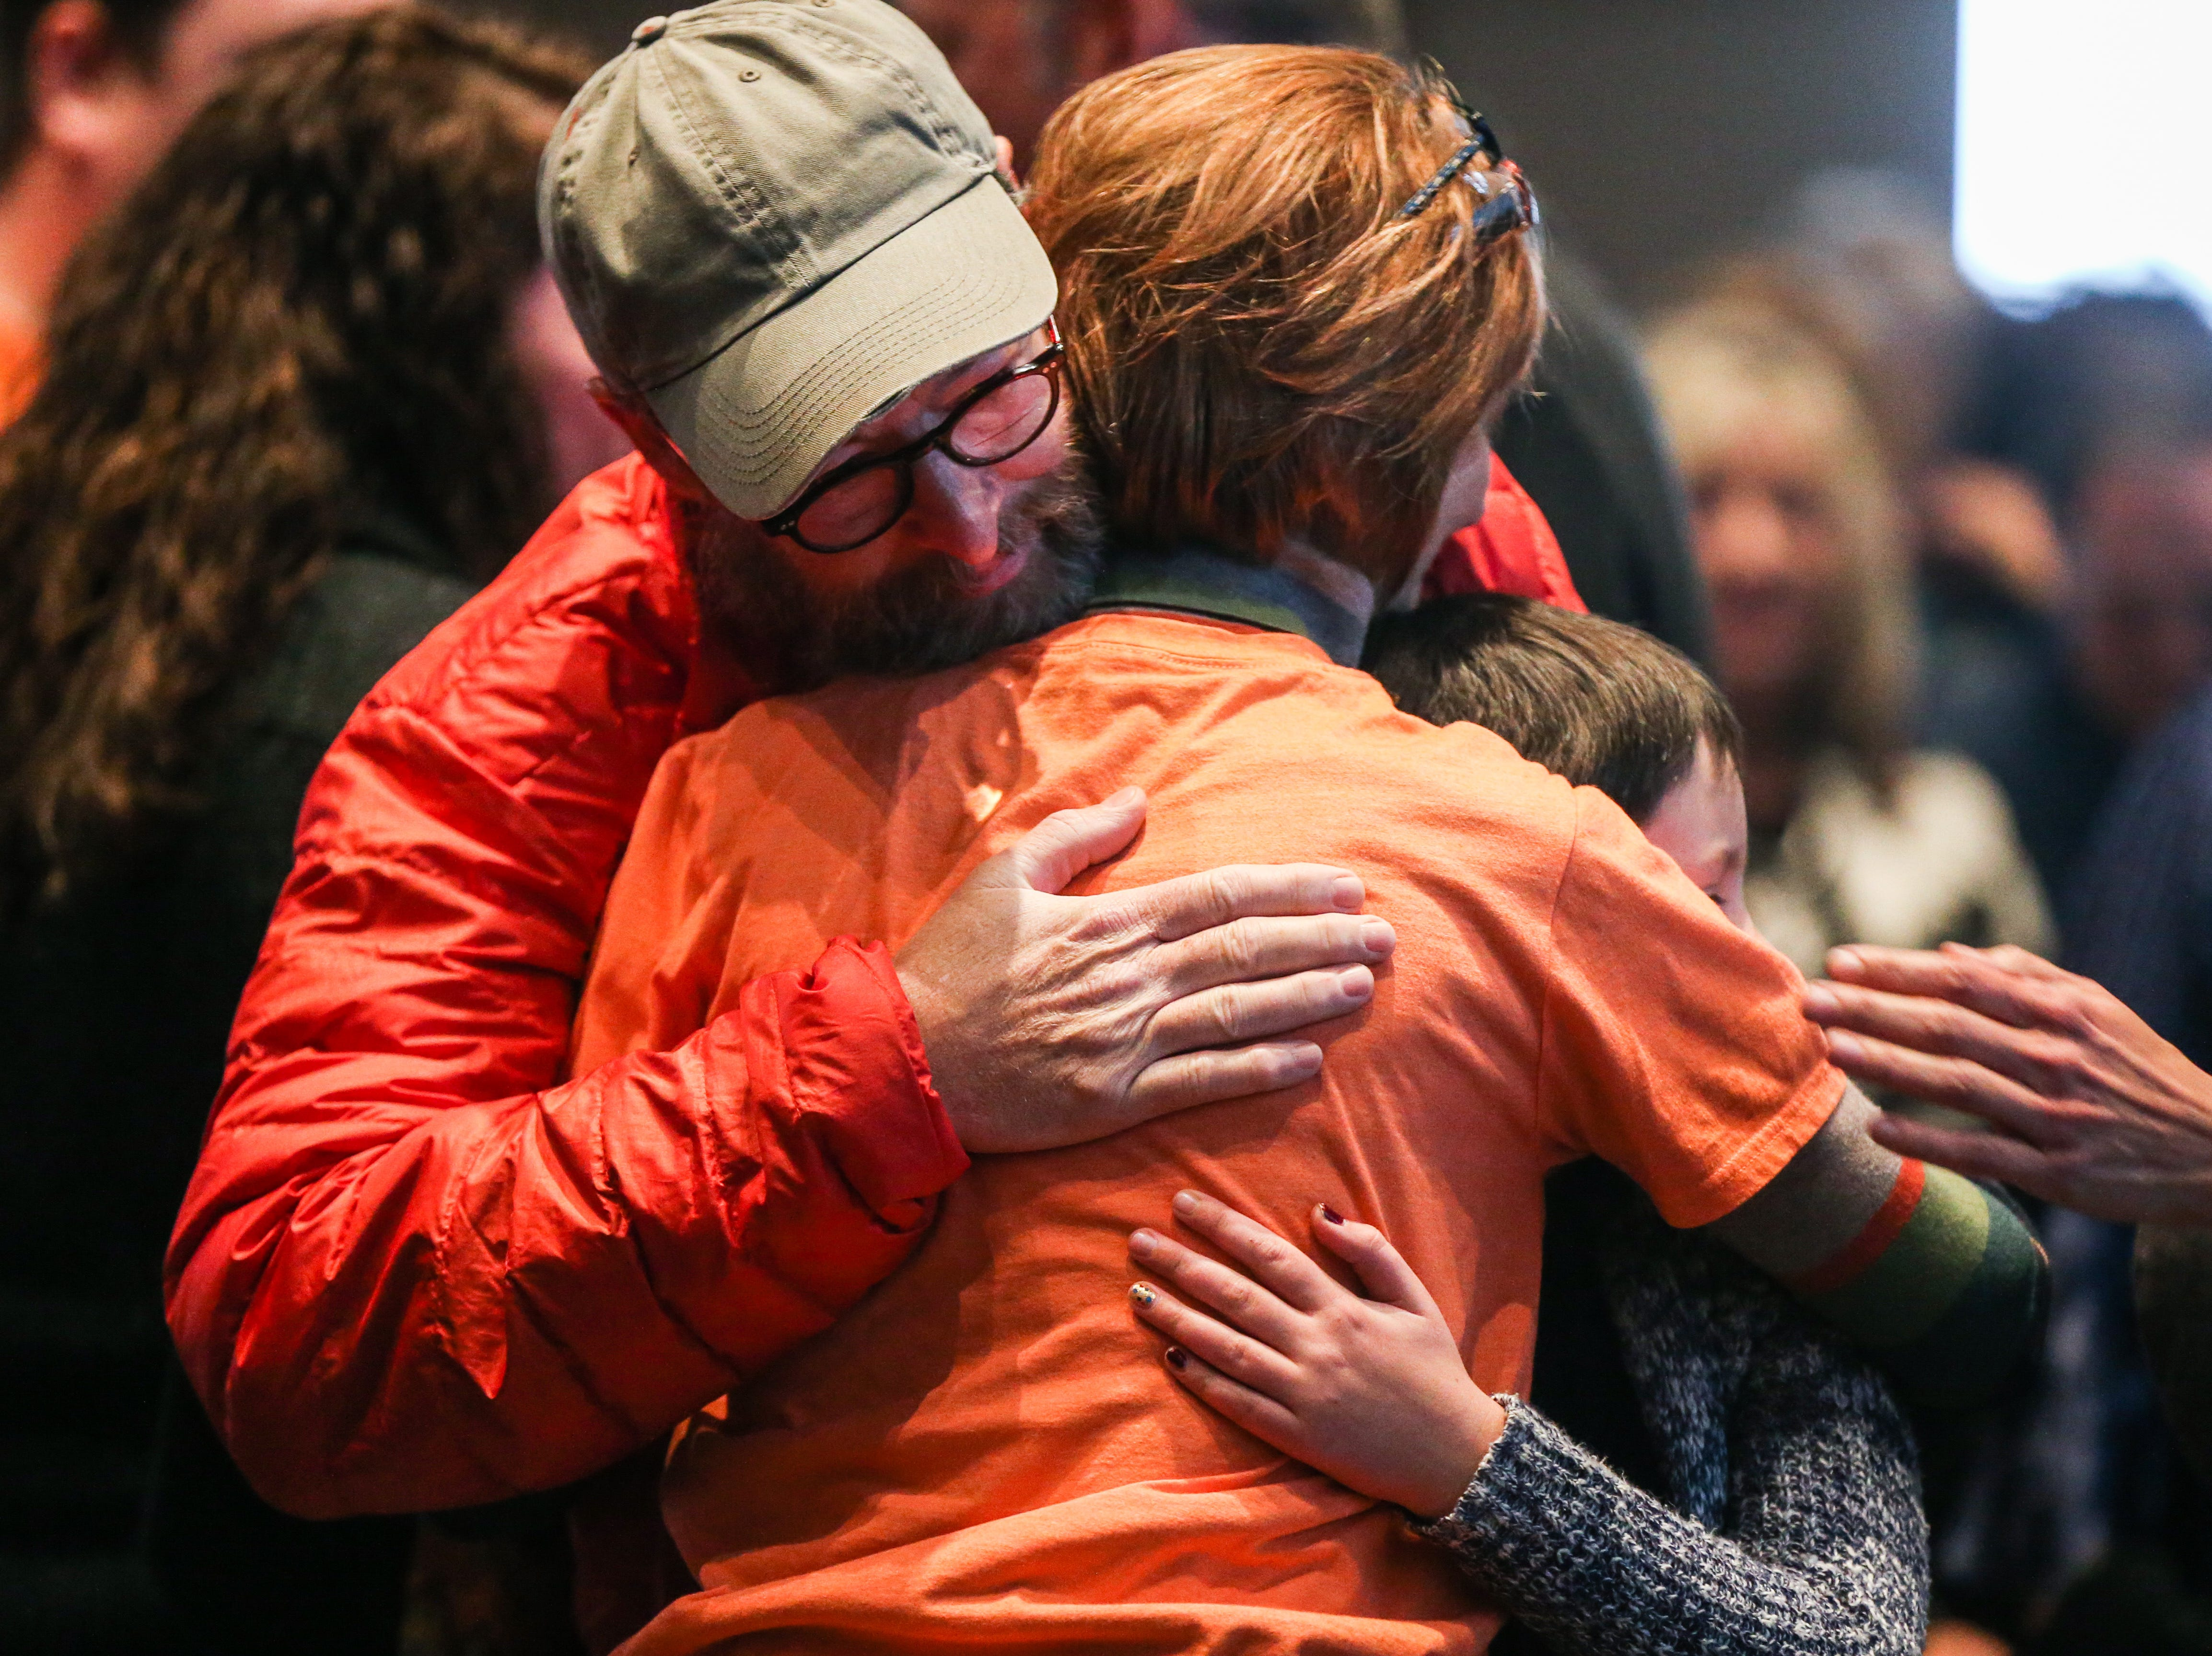 Attendees hug Pam Bladine after the Celebration of Spirit for Roger Allen Sunday, Jan. 13, 2019, at San Angelo Museum of Fine Arts.